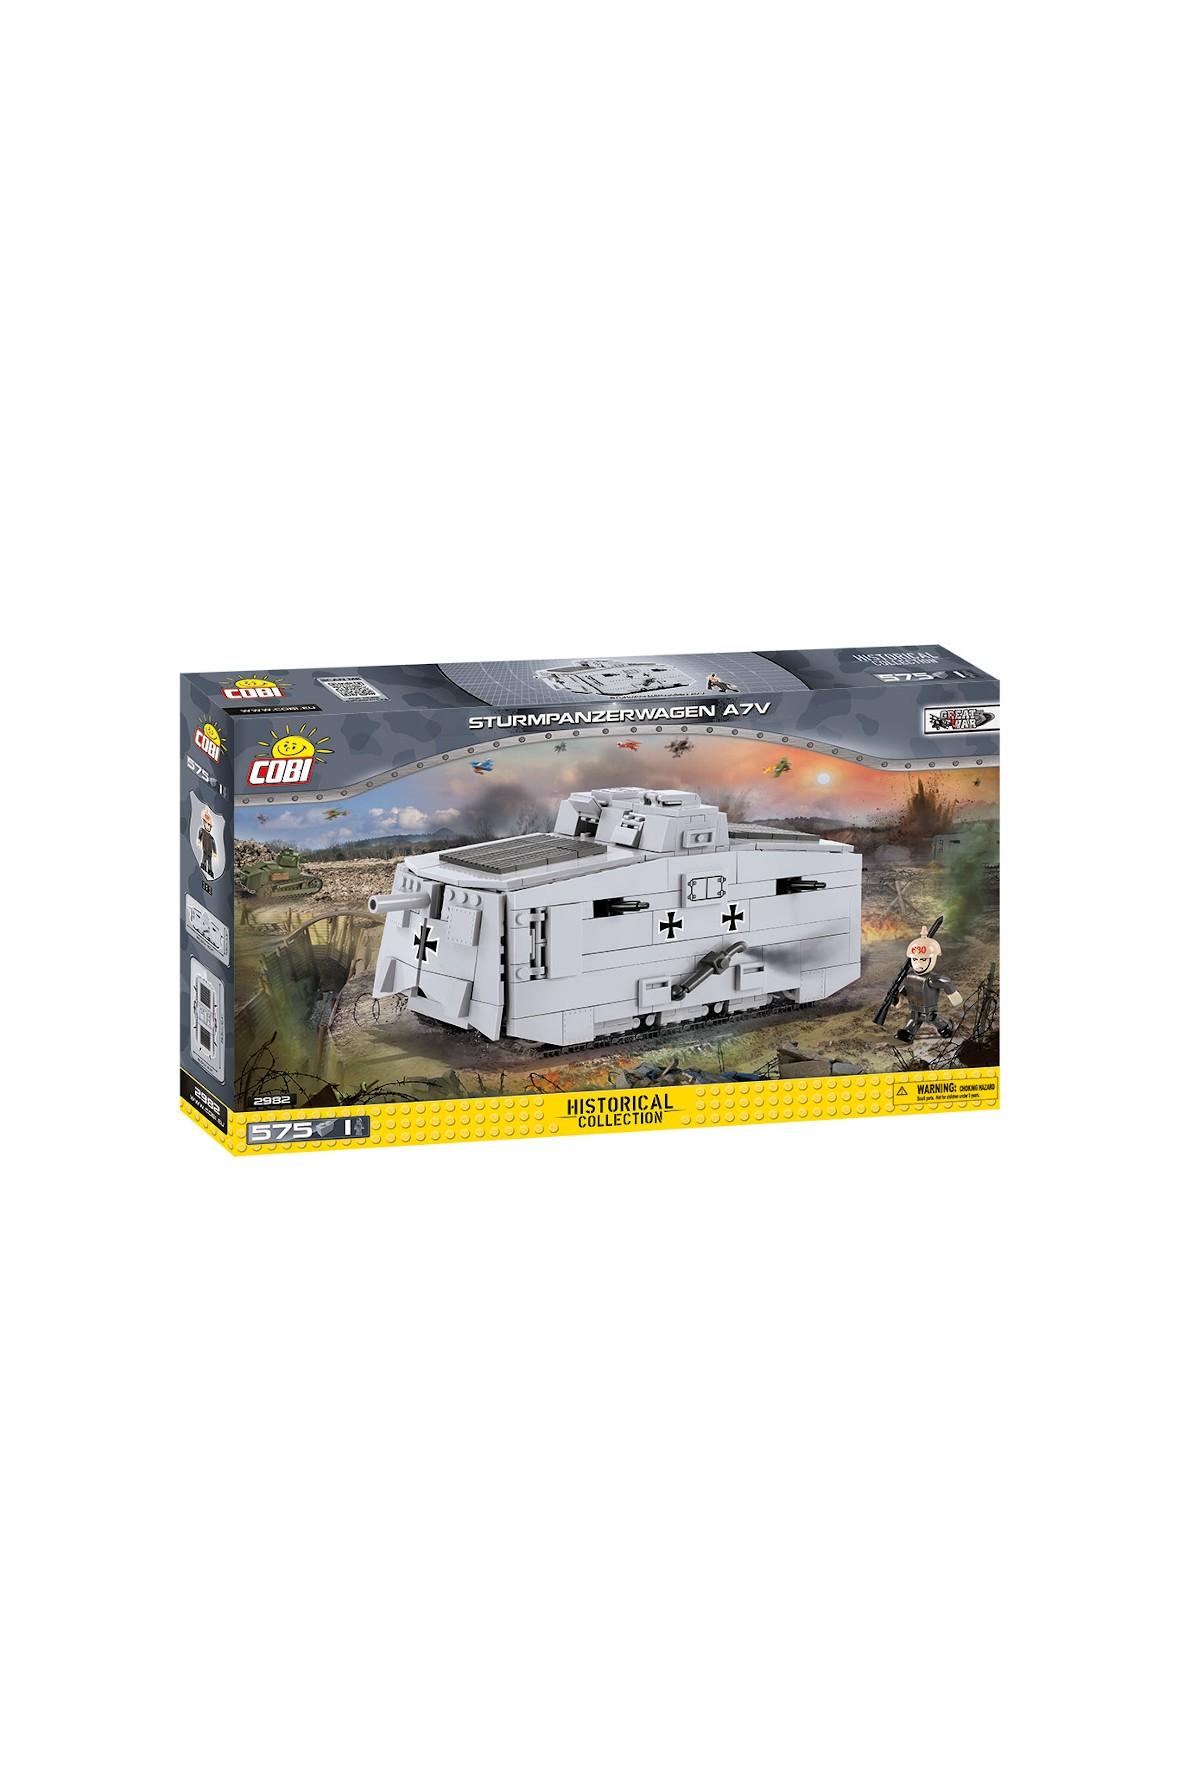 Klocki Cobi Small Army Sturmpanzerwagen ATV 575el